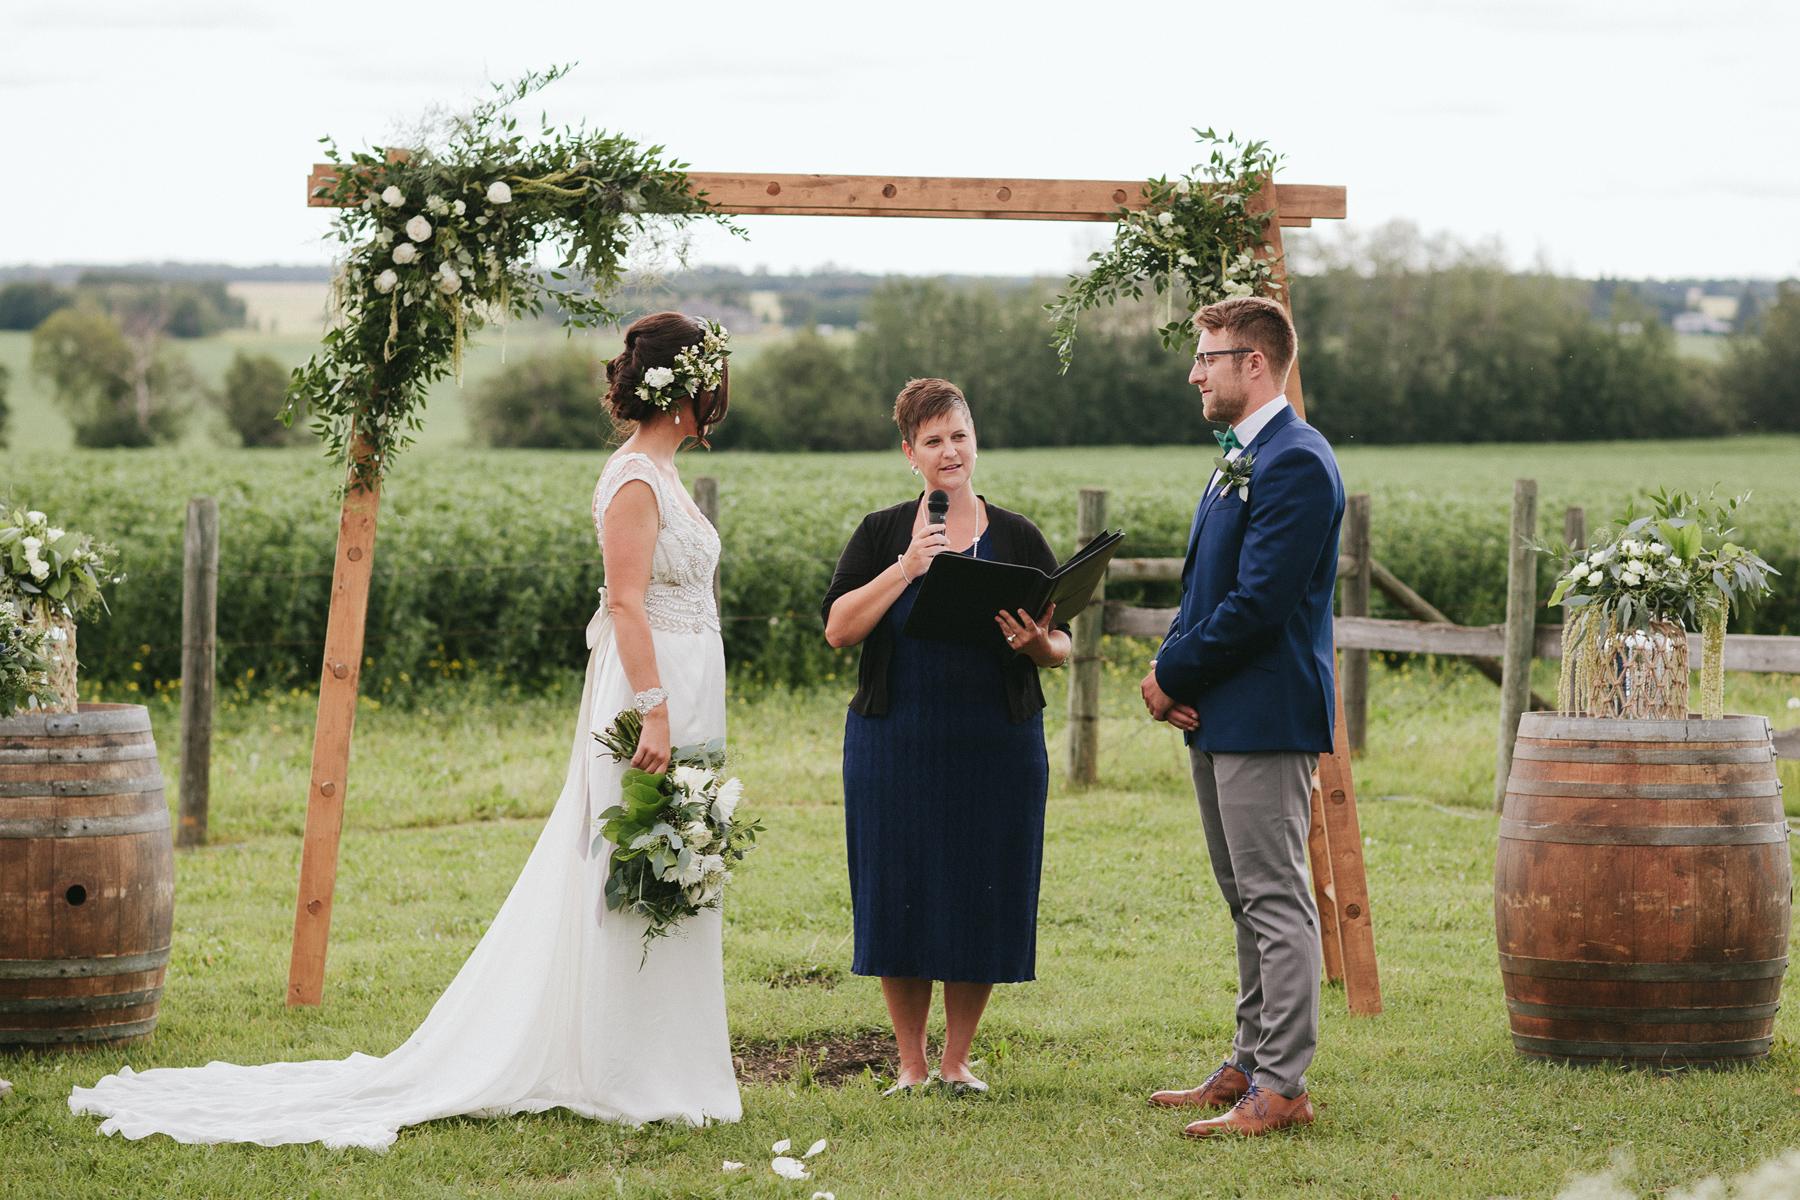 alberta-farm-wedding-photographer-rp-wj-108.jpg